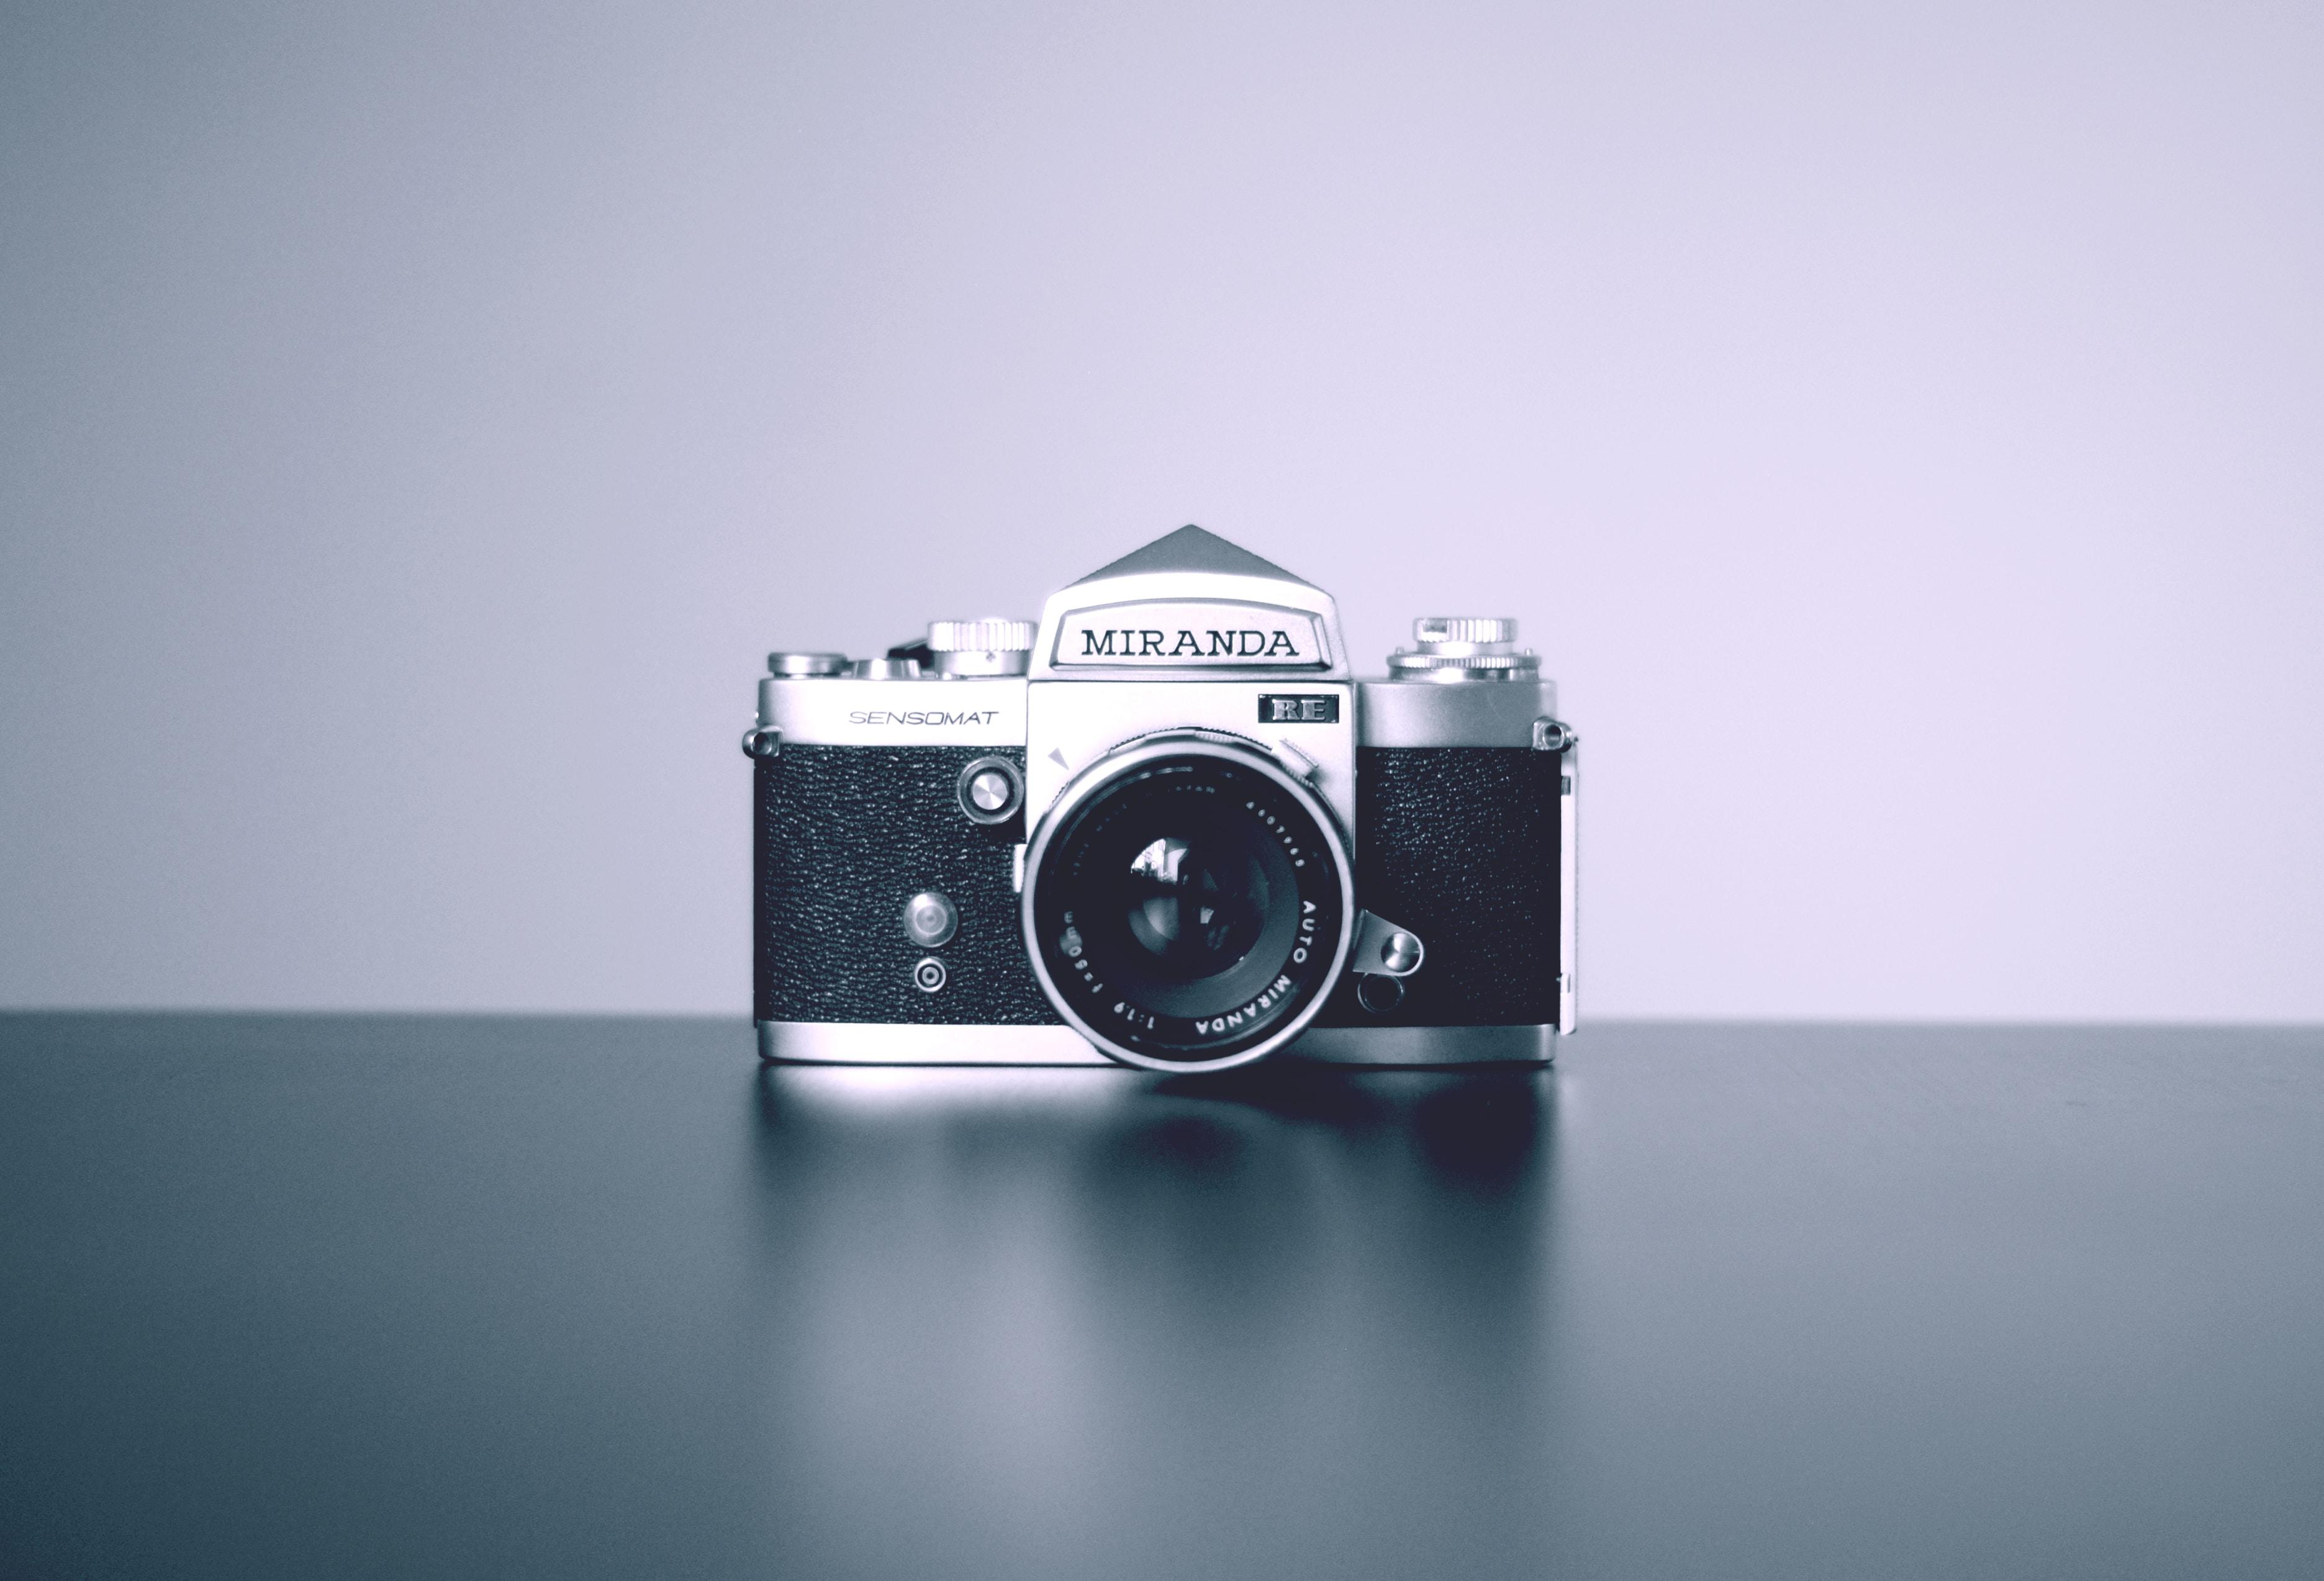 gray and black Miranda DSLR camera